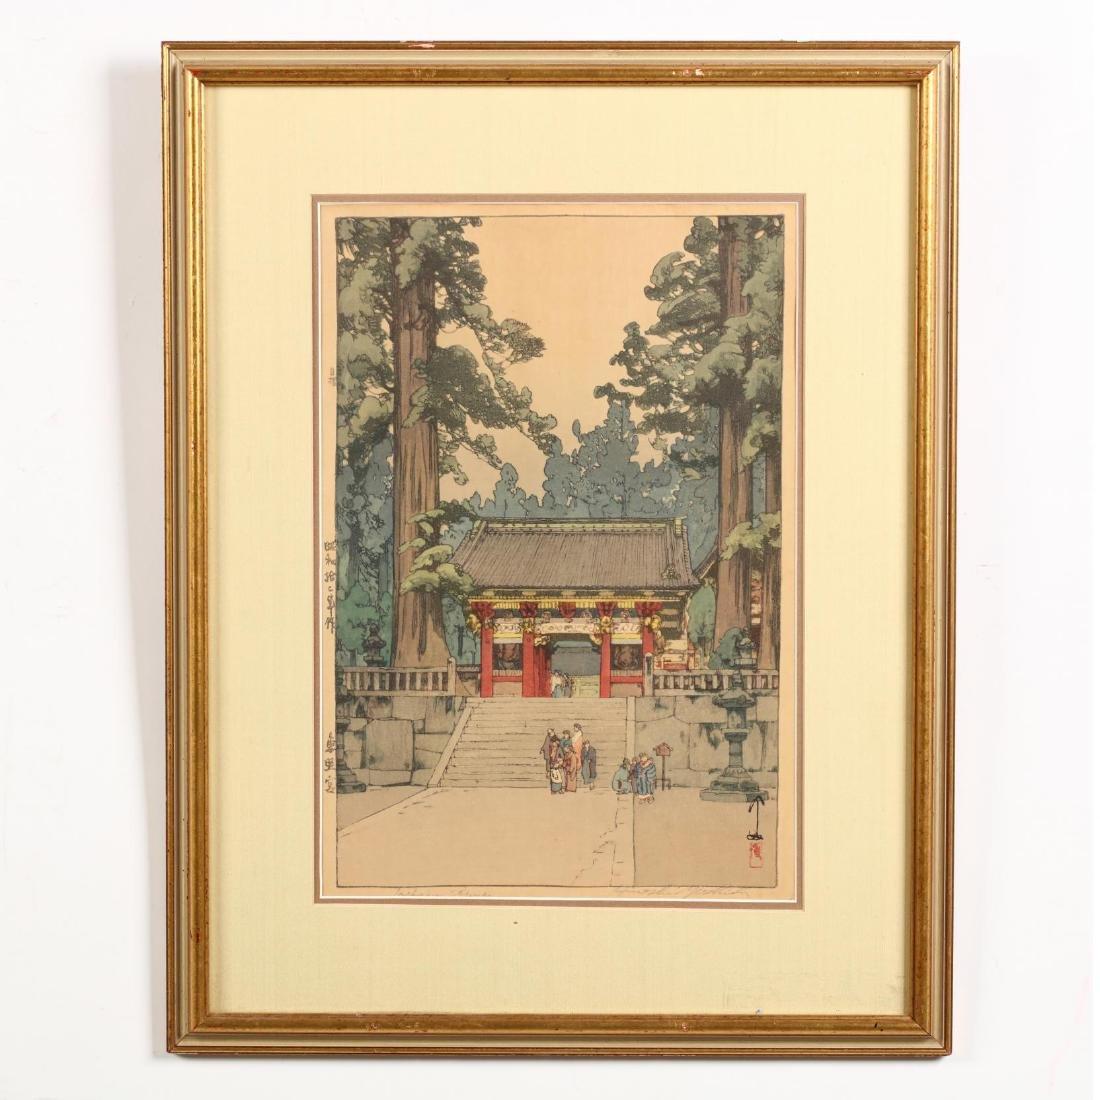 Three Japanese Woodblock Prints by Hiroshi Yoshida - 9